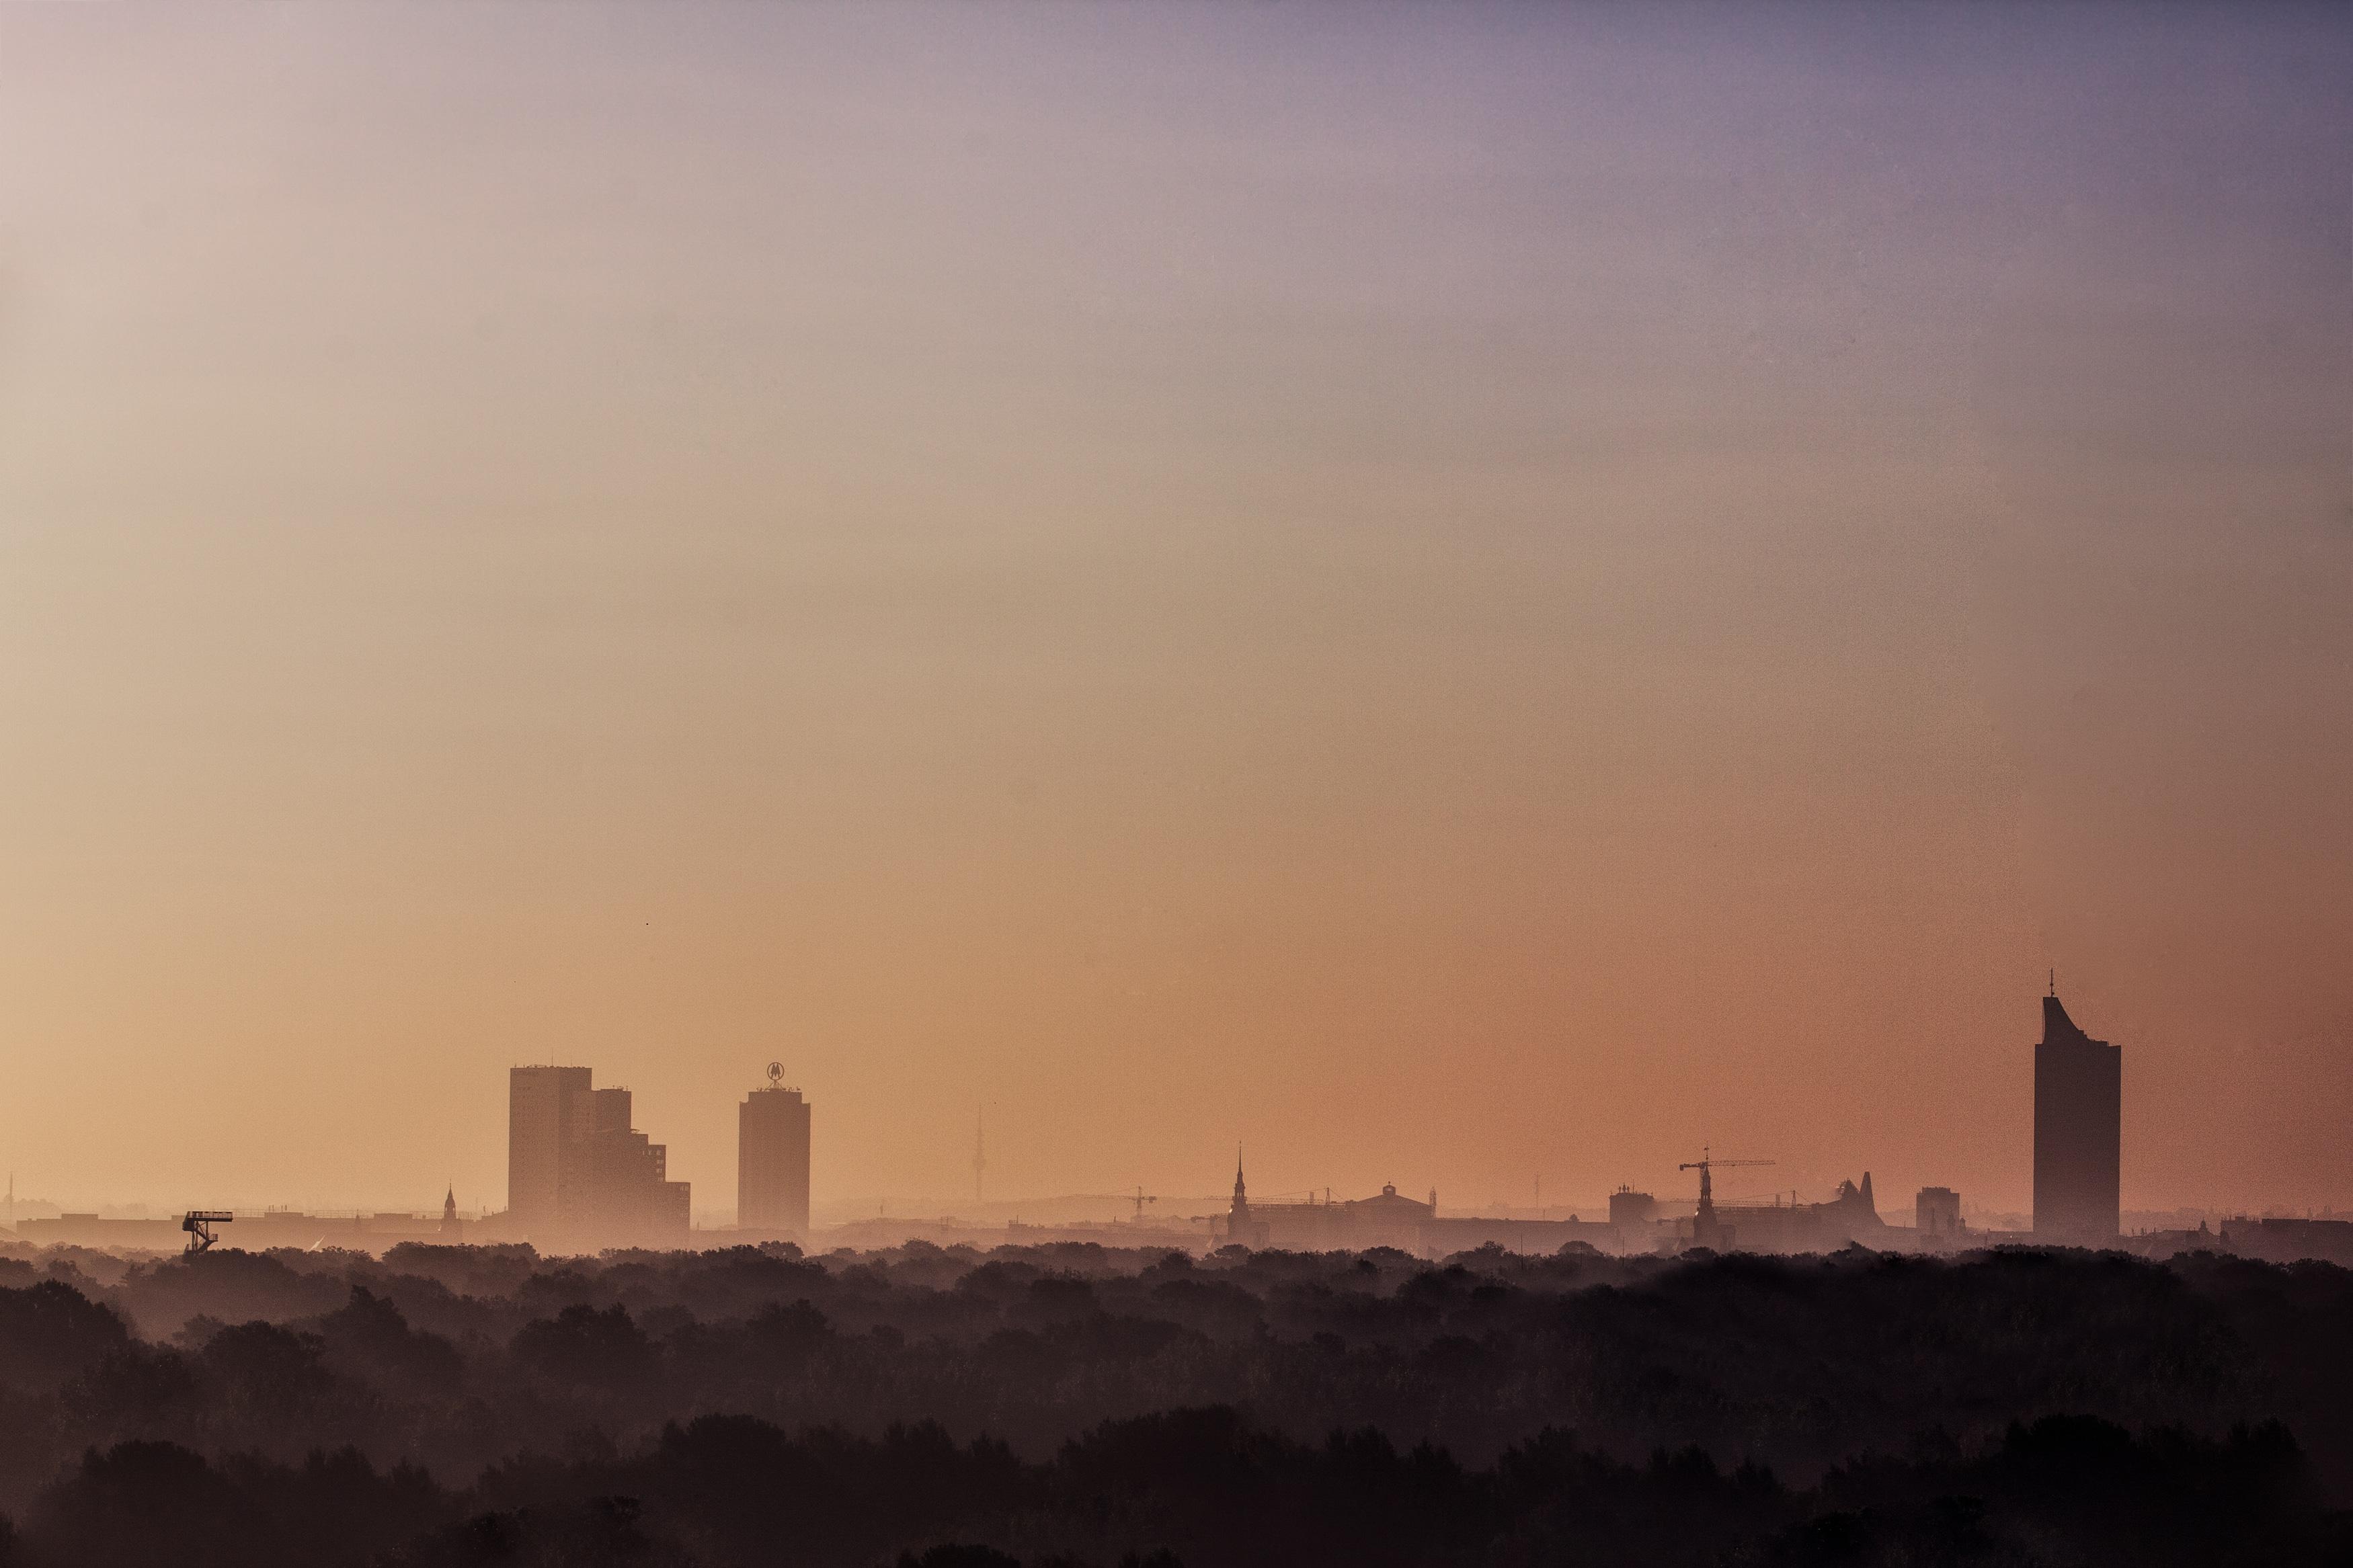 Robin-Sonnenaufgang-3526-Bearbeitet